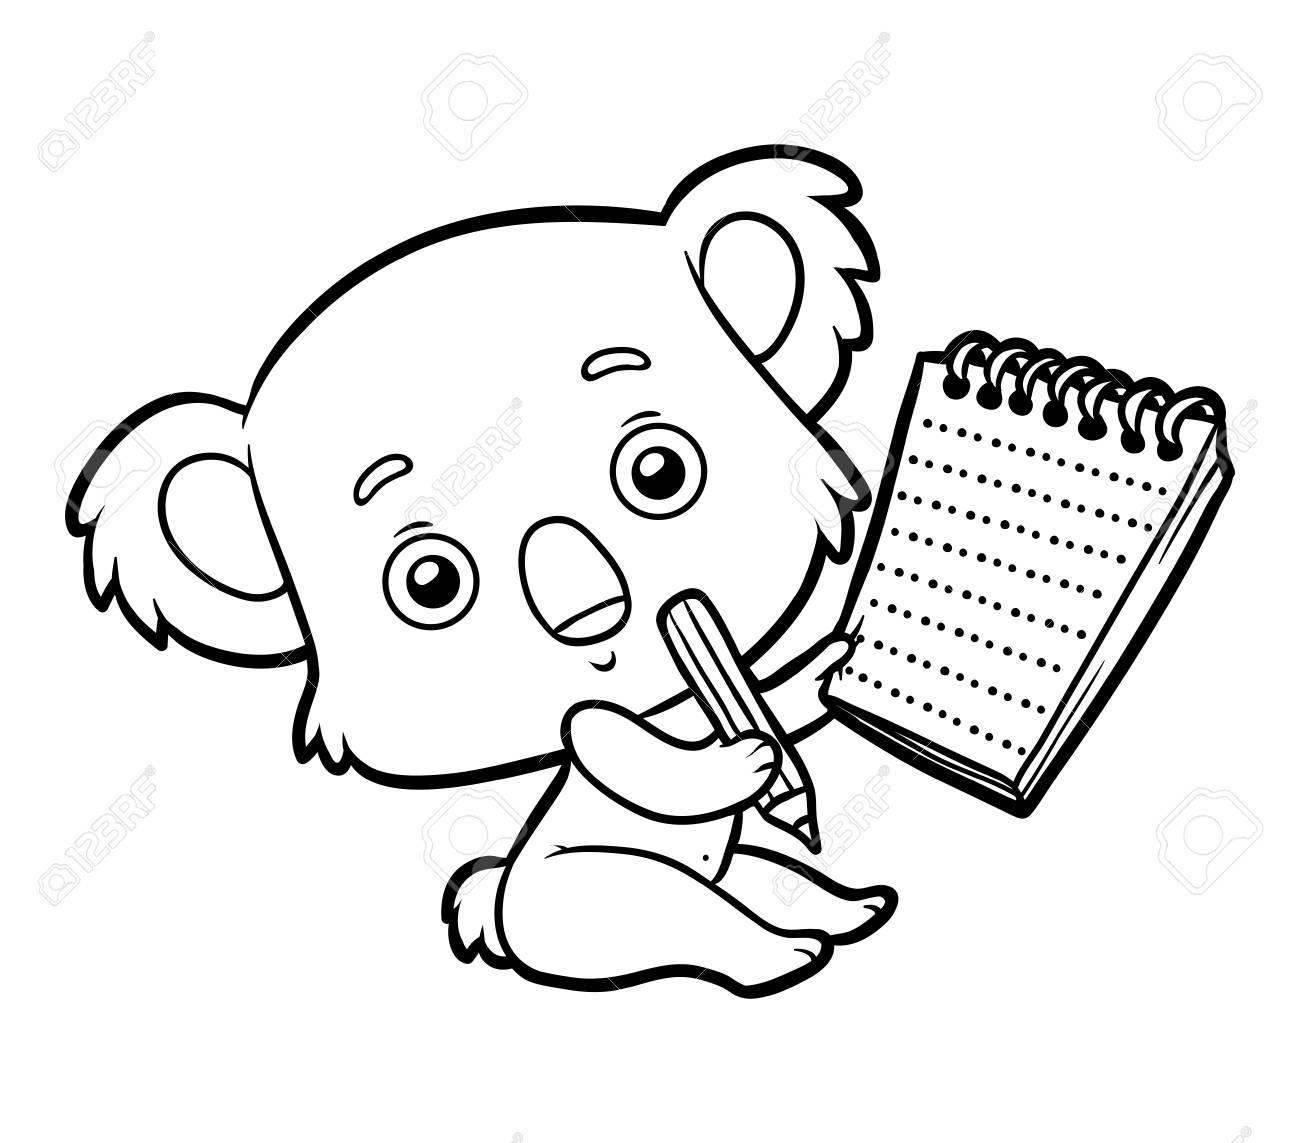 Dibujo Para Colorear Para Niños Koala